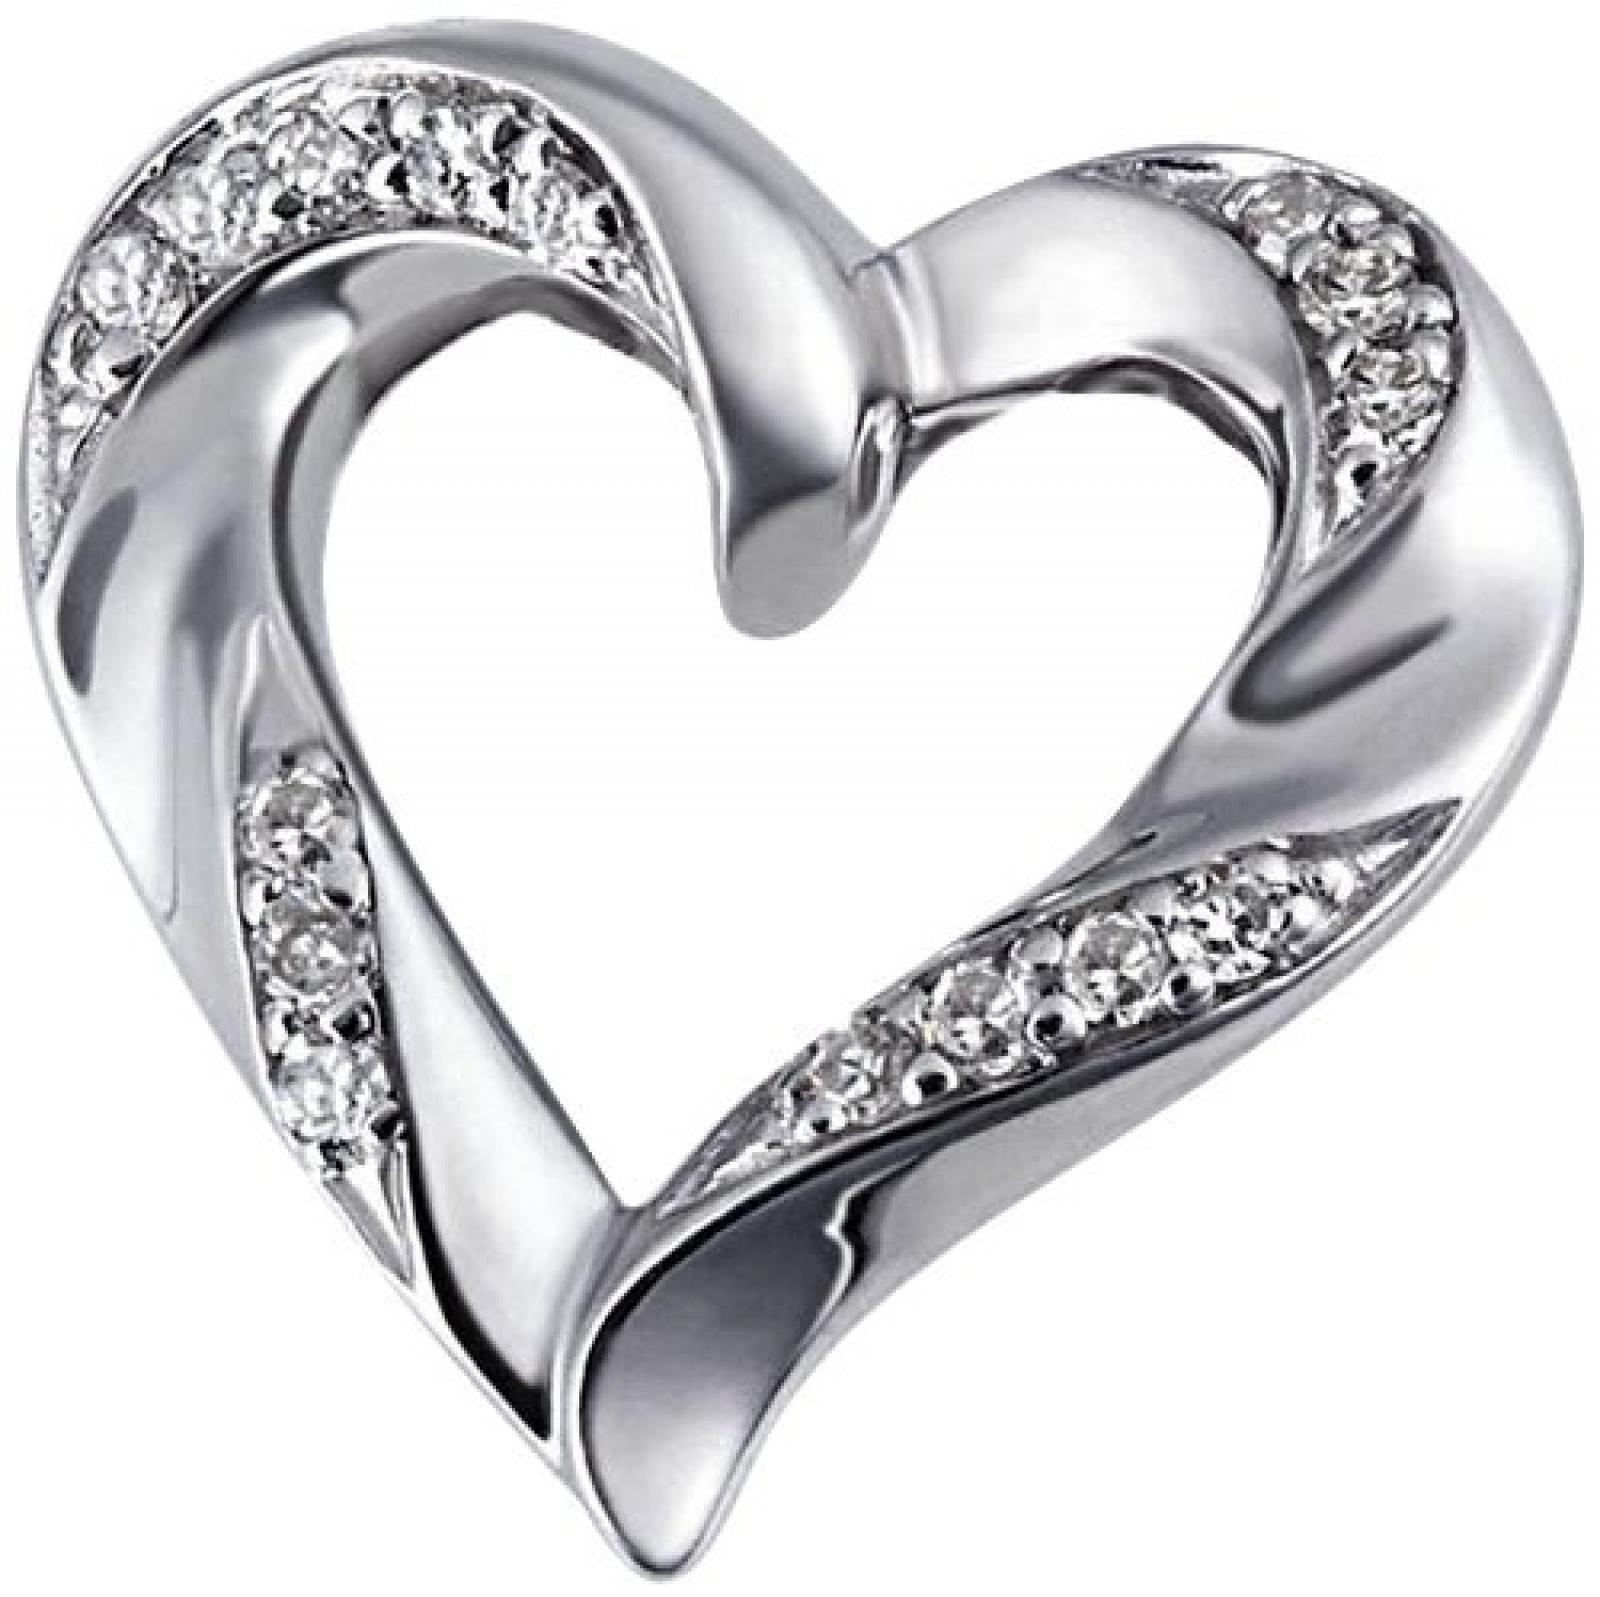 Goldmaid Damen-Anhänger 9 Karat 375 Weißgold Herz Hochglanz 15 Diamanten SI/H 0,08 ct. He A6335WG